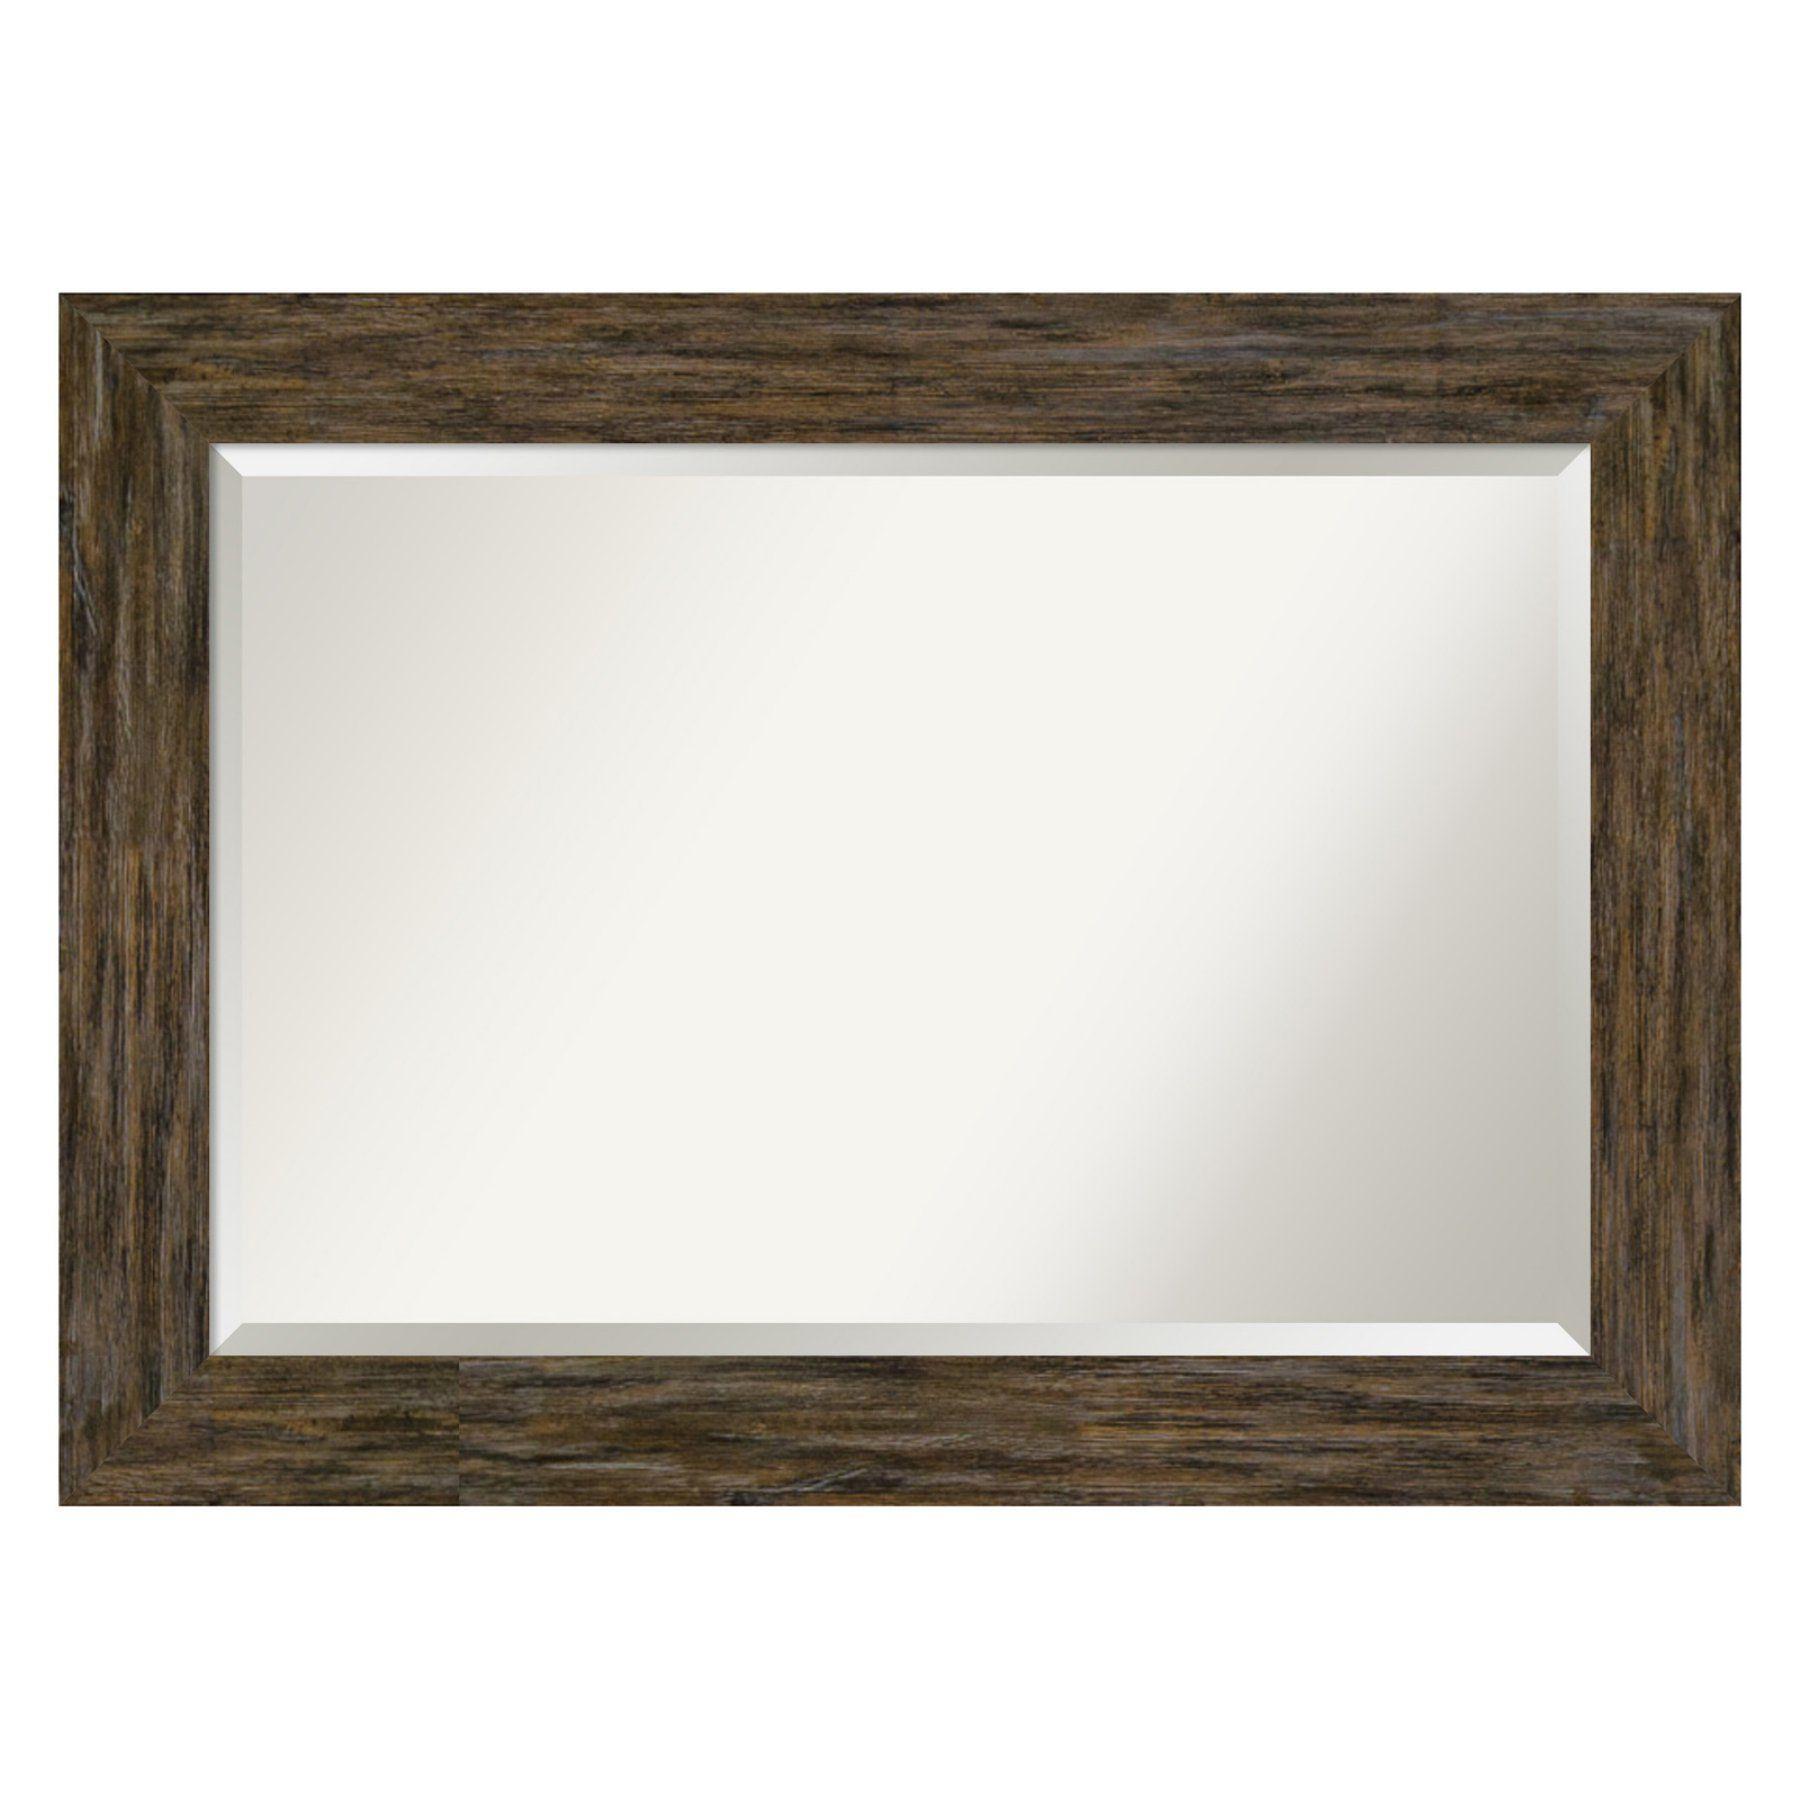 Amanti Art Fencepost Rectangular Beveled Bathroom Vanity Inside Northcutt Accent Mirrors (View 22 of 30)